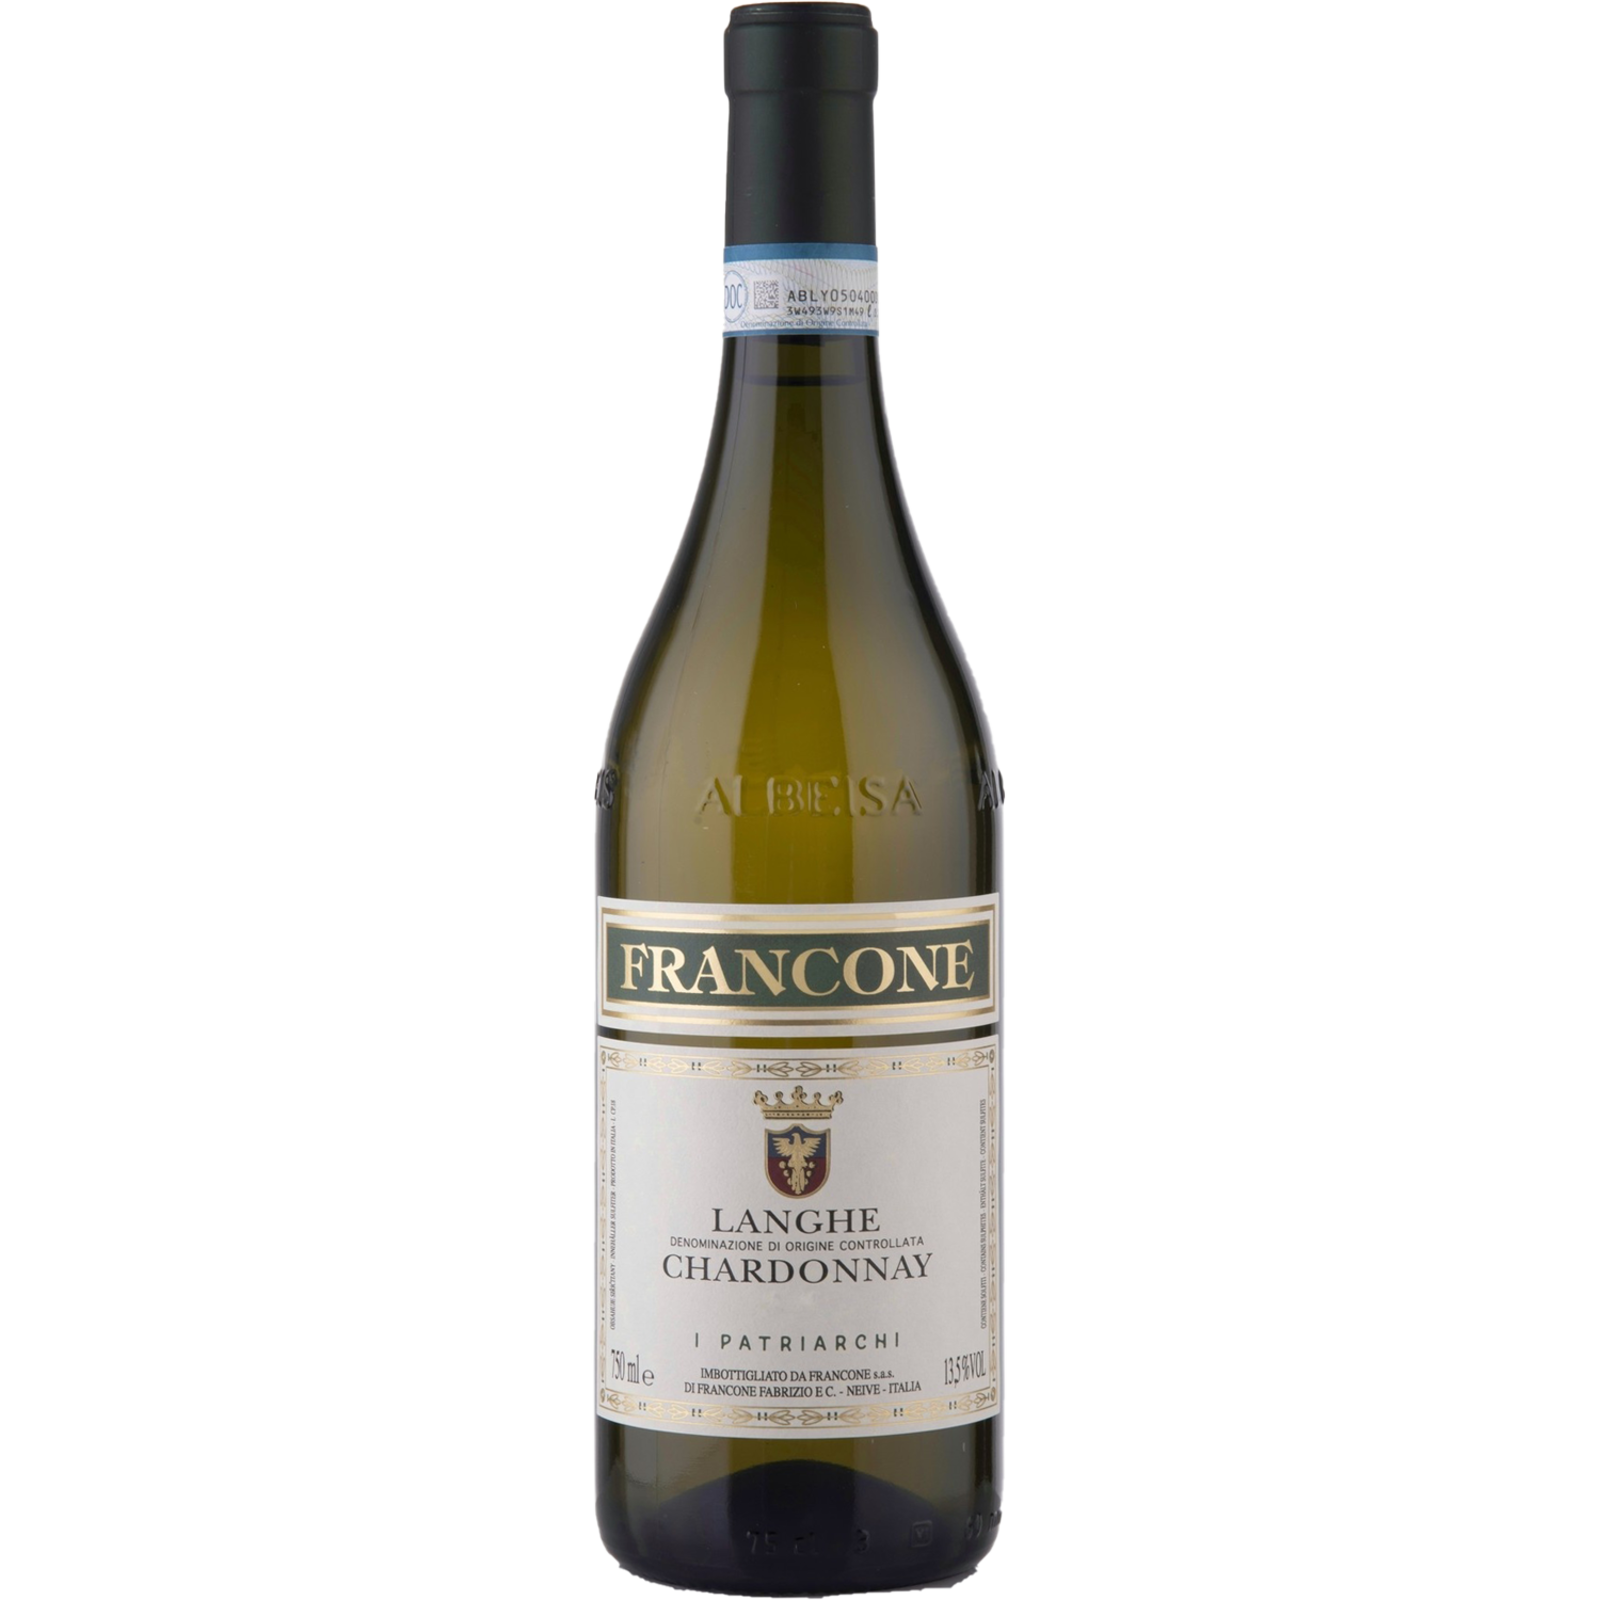 Francone Francone Langhe Chardonnay I Patriarchi 2019